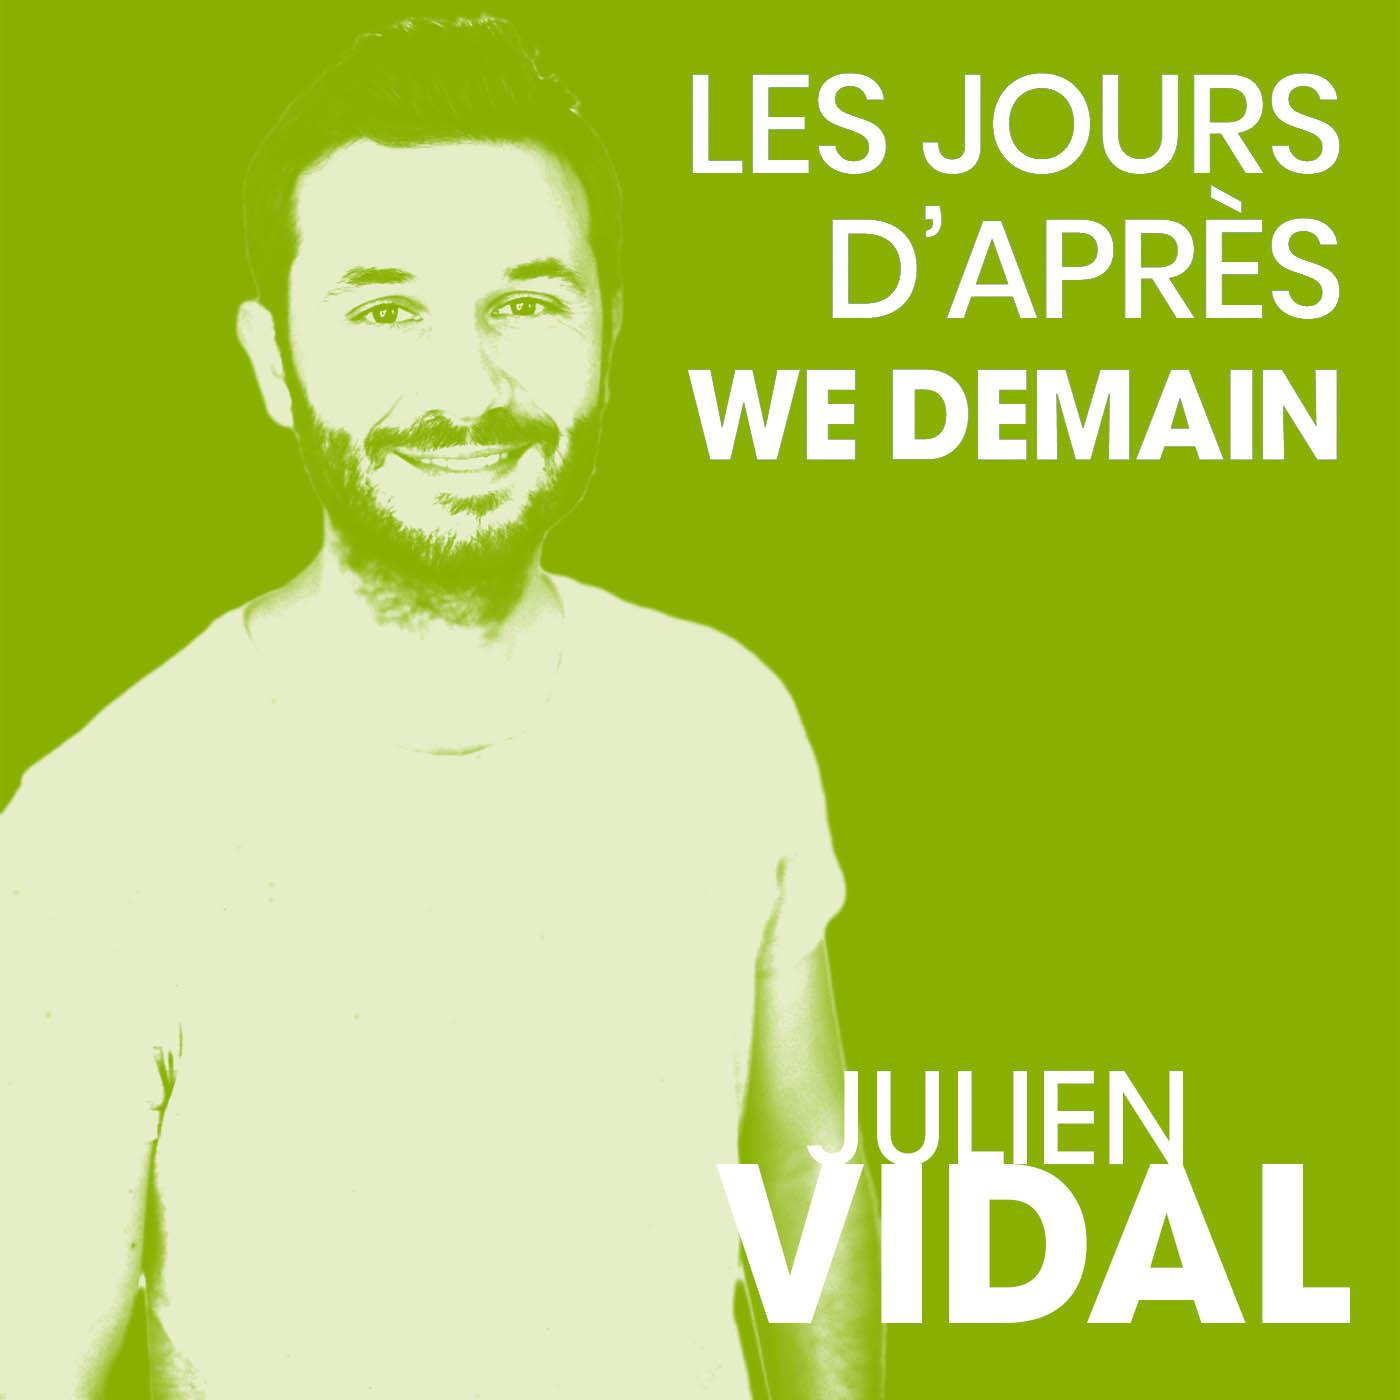 Julien Vidal